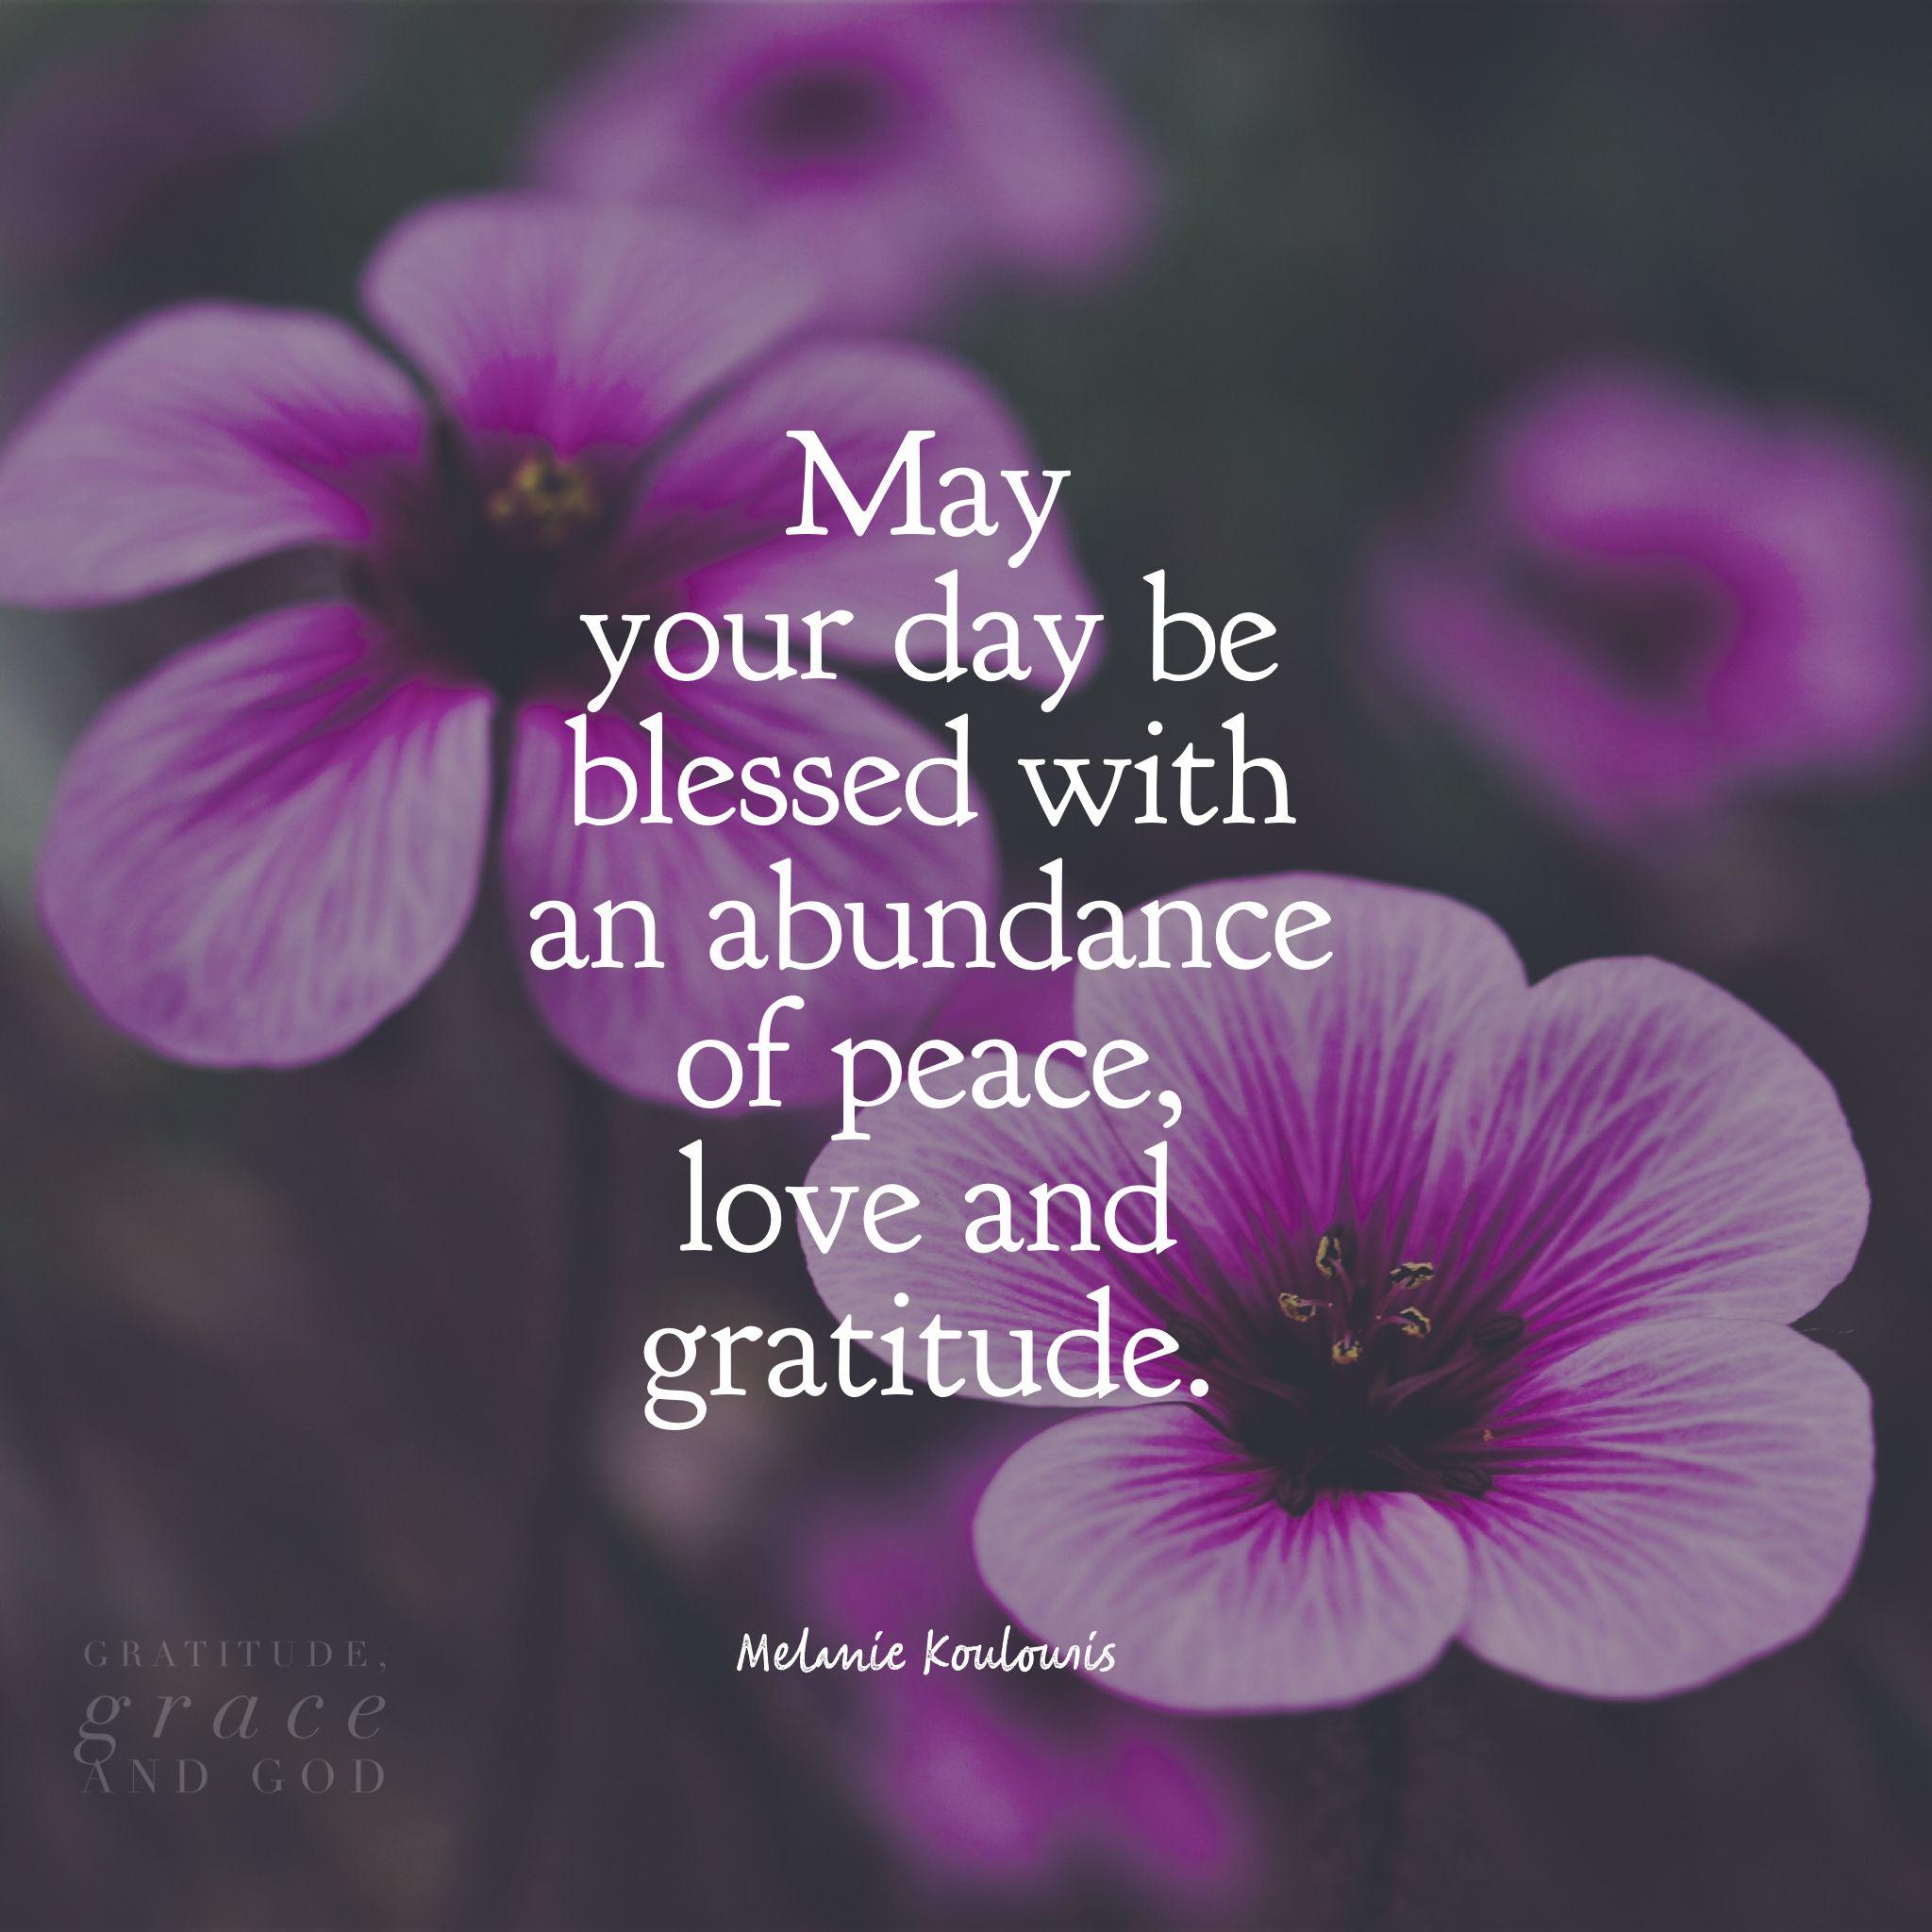 Melanie Koulouris Flower Quotes Daily Encouragement Kindness Quotes